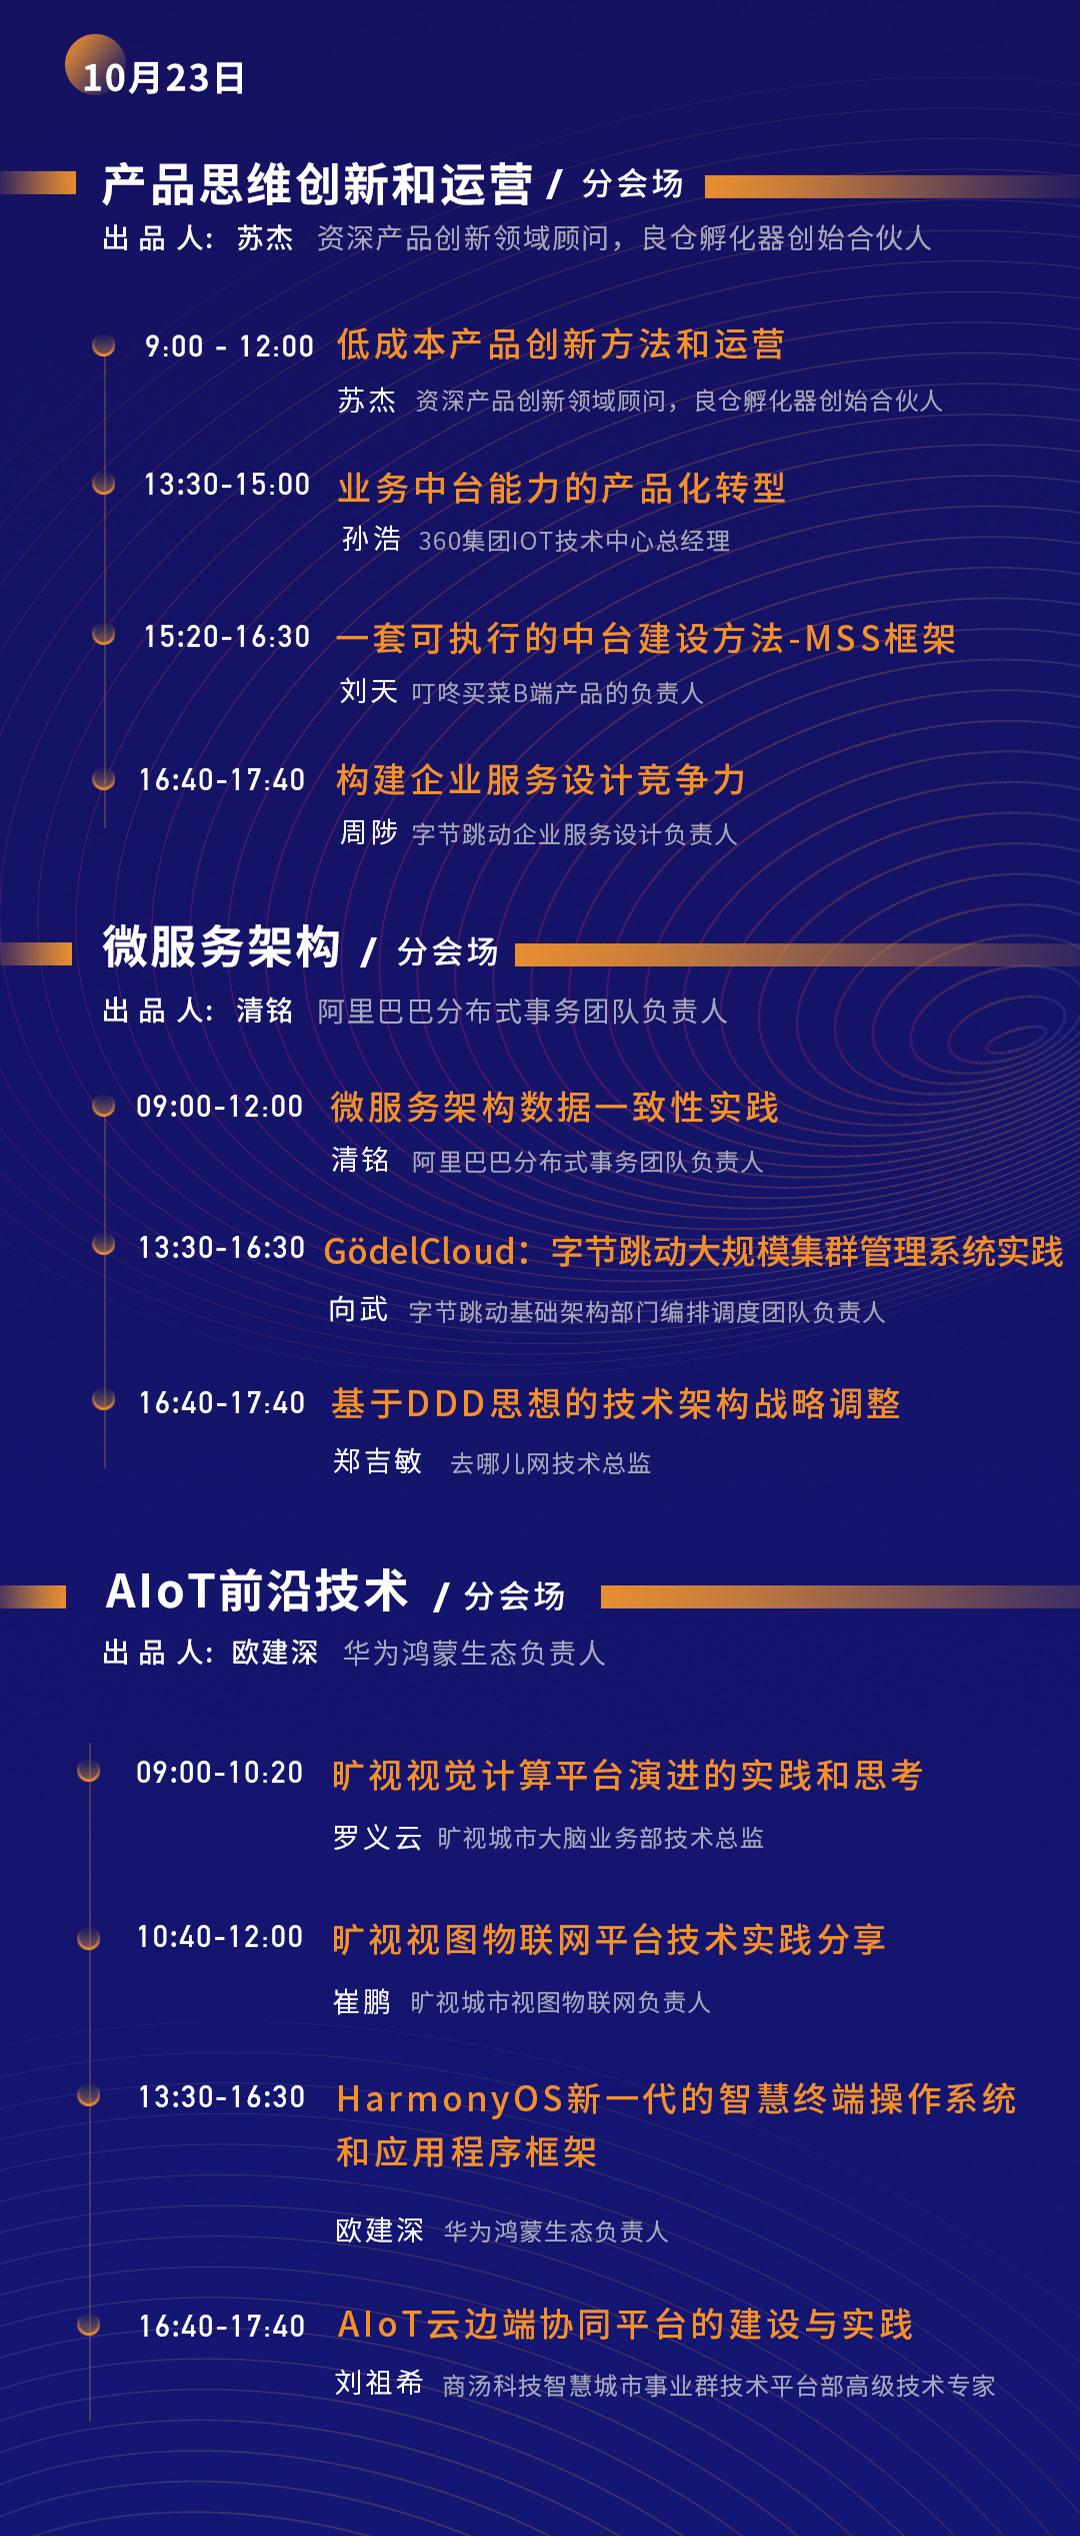 CSDI 2021中国软件研发管理行业技术峰会